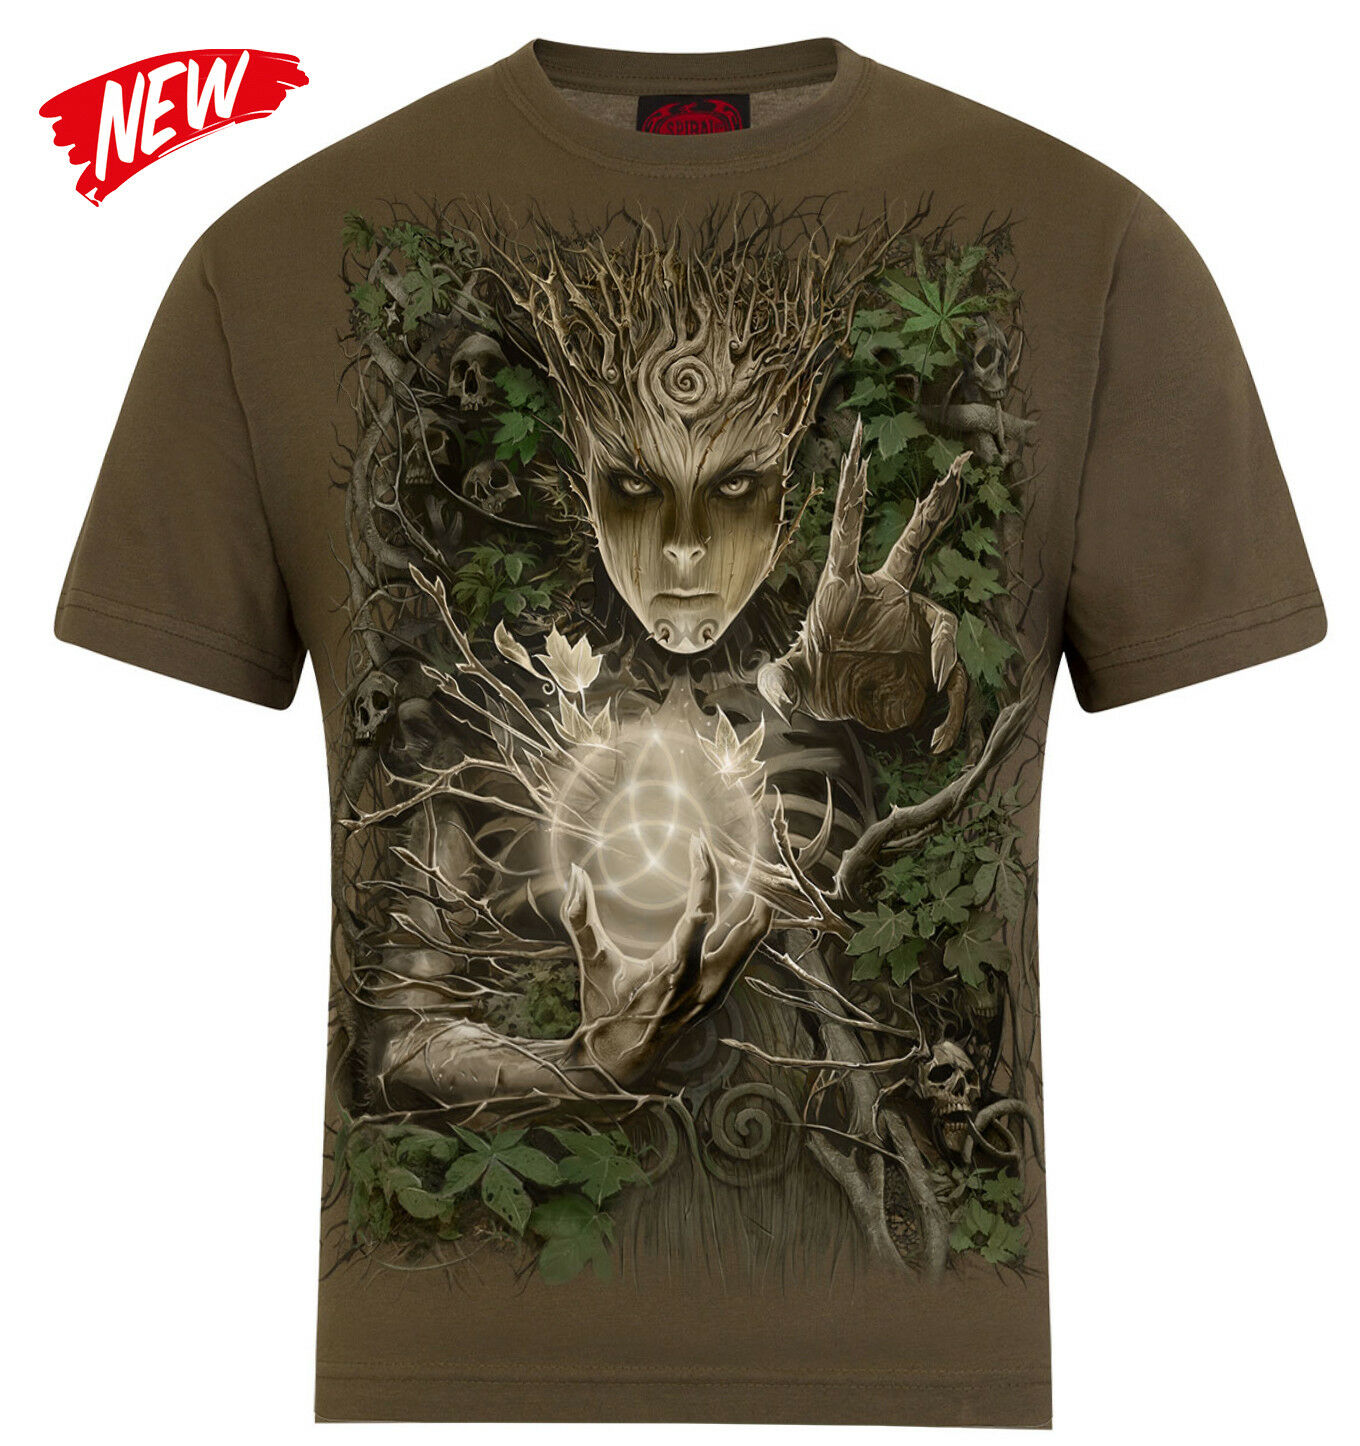 SPIRAL DIRECT OAK PRINCESS T Shirt Green Man Magic Fantasy Tribal Tattoo Top Tee